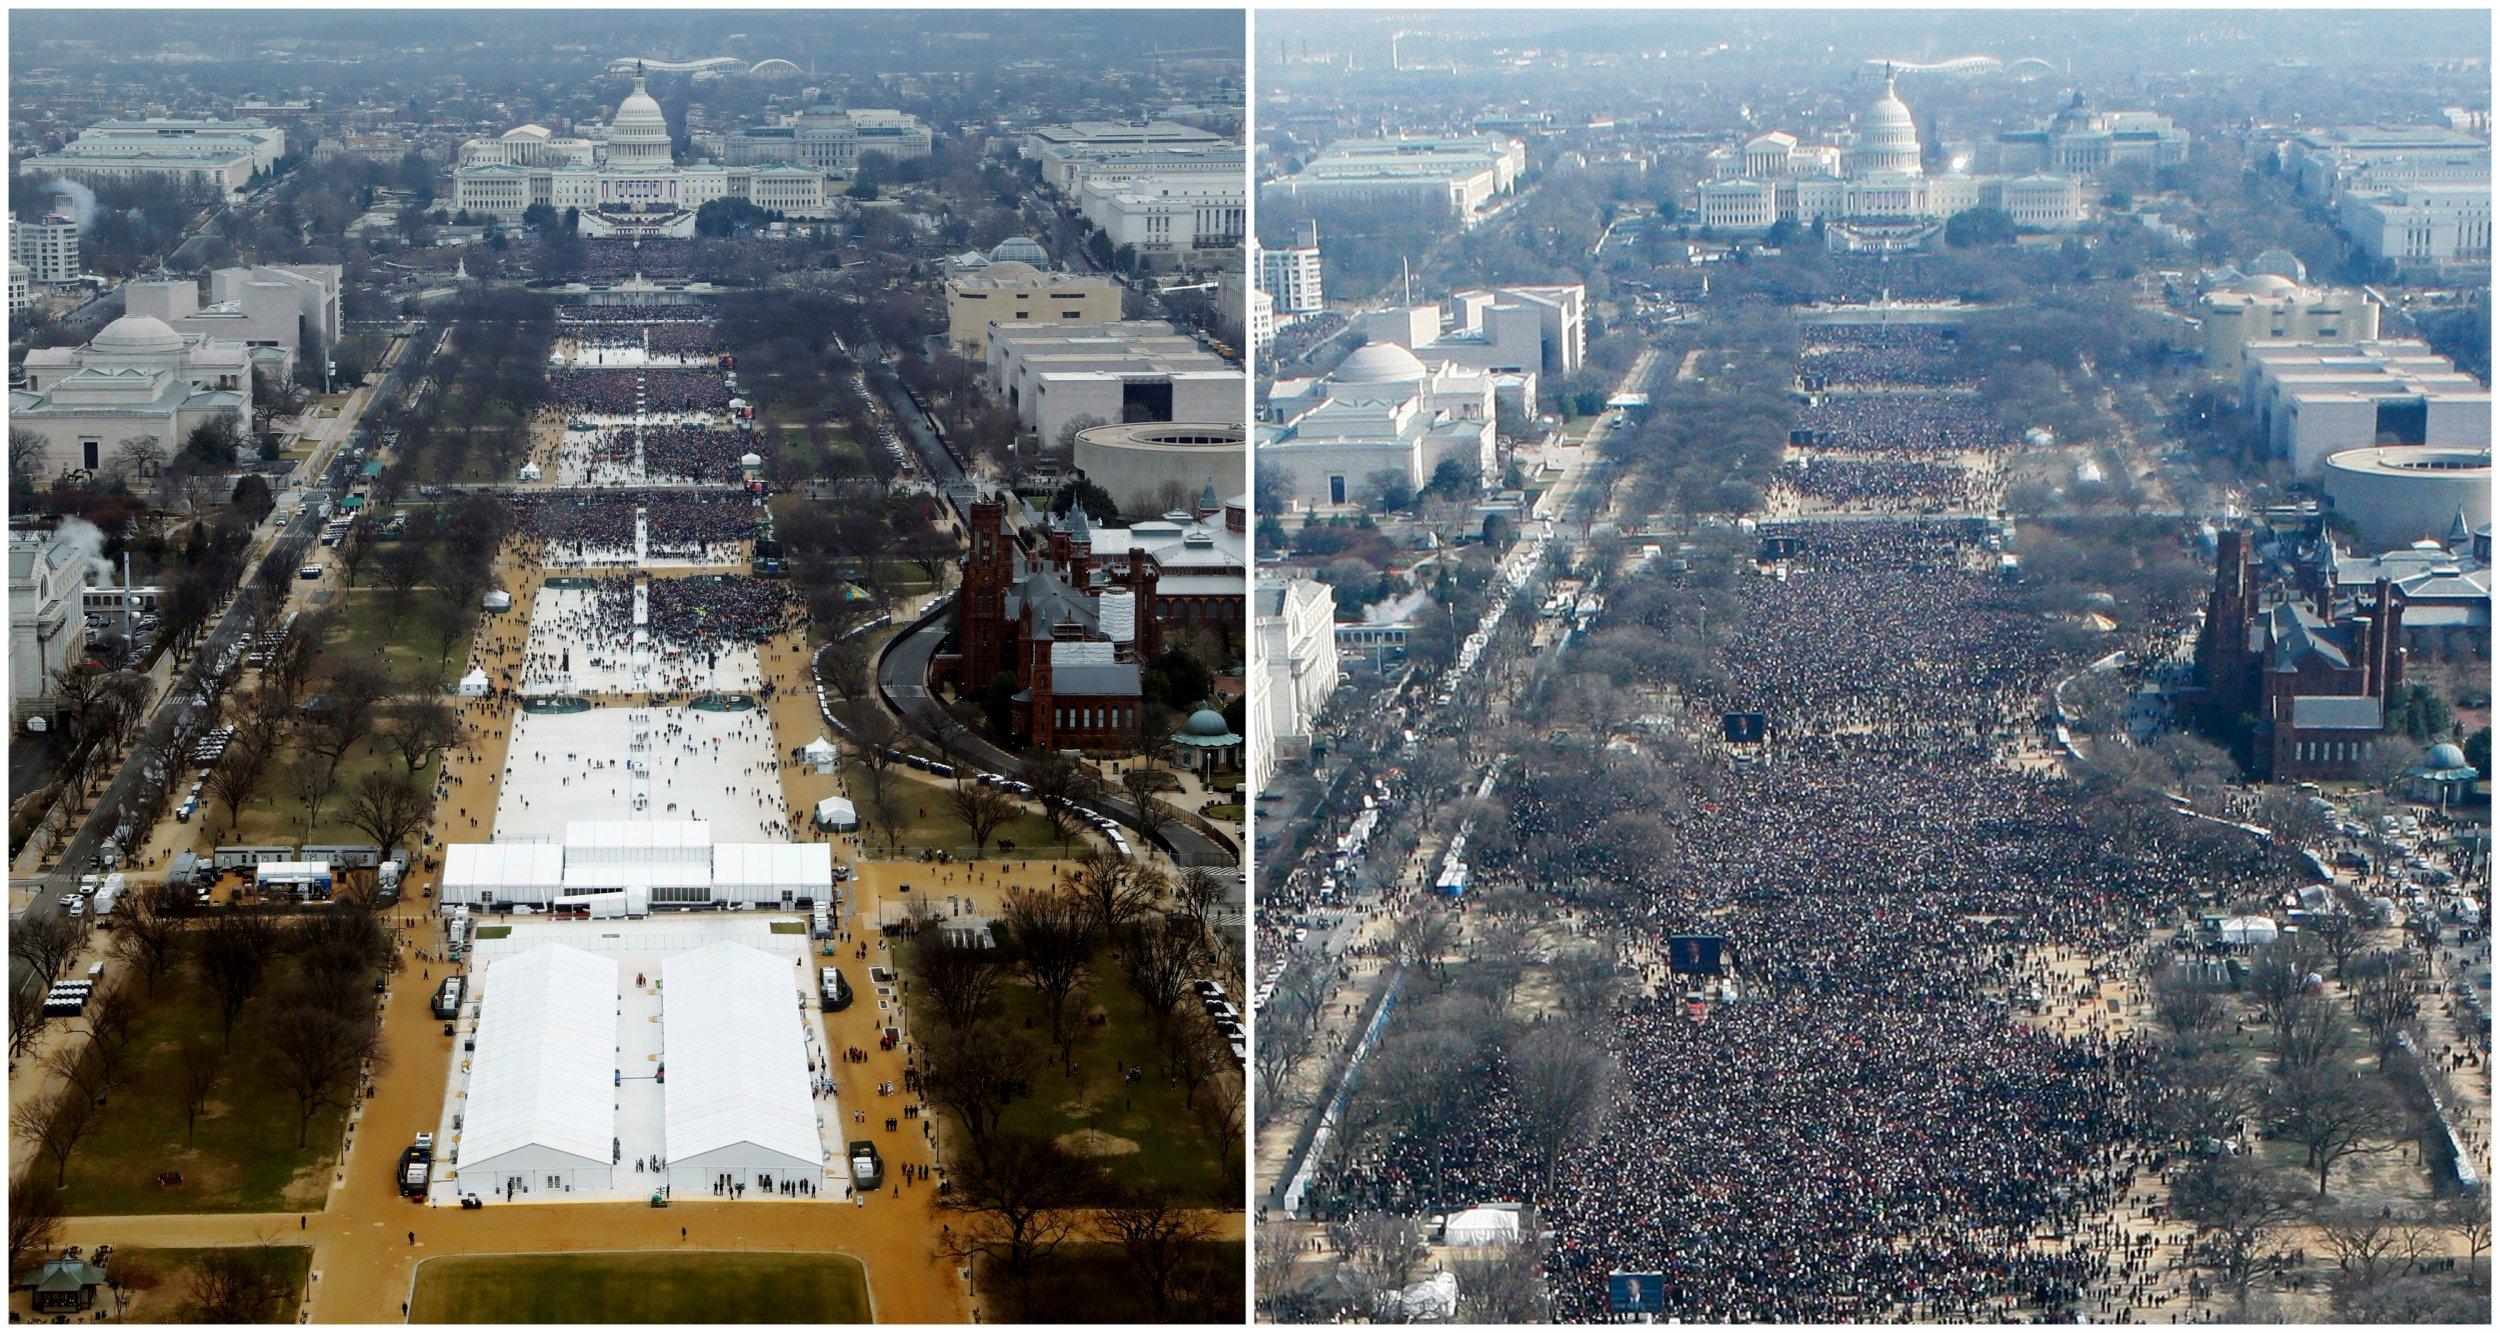 01_23_Trump_Crowd_01